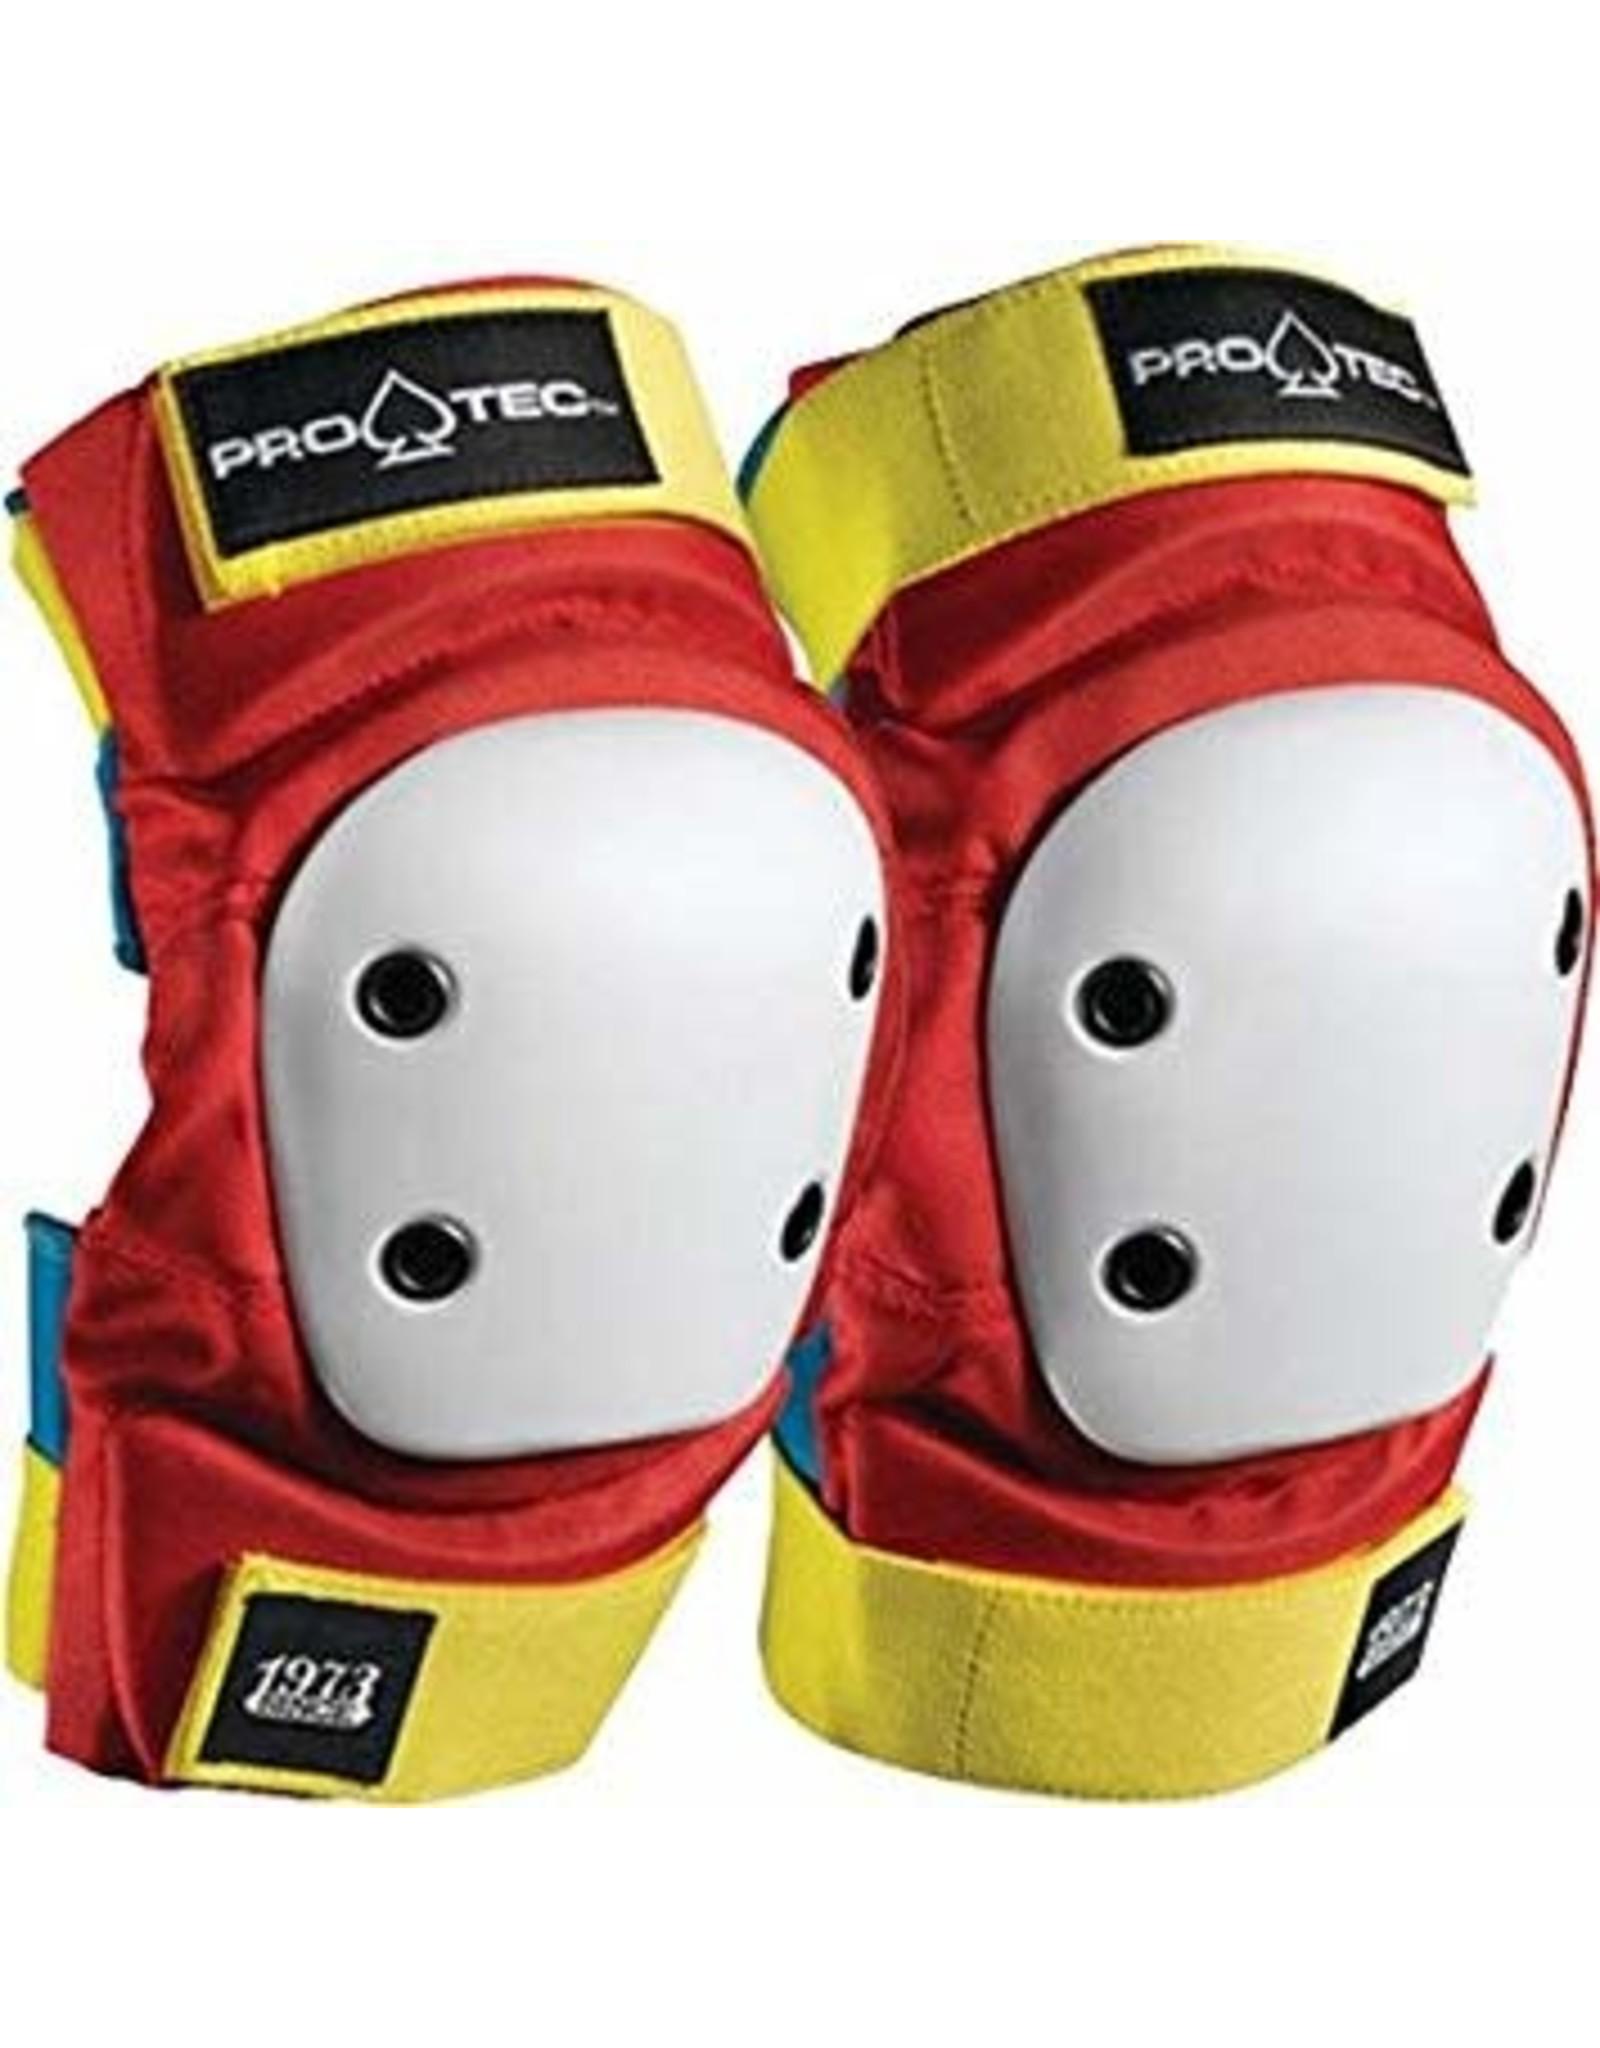 pro-tec Pro-tec - protection skateboard coude